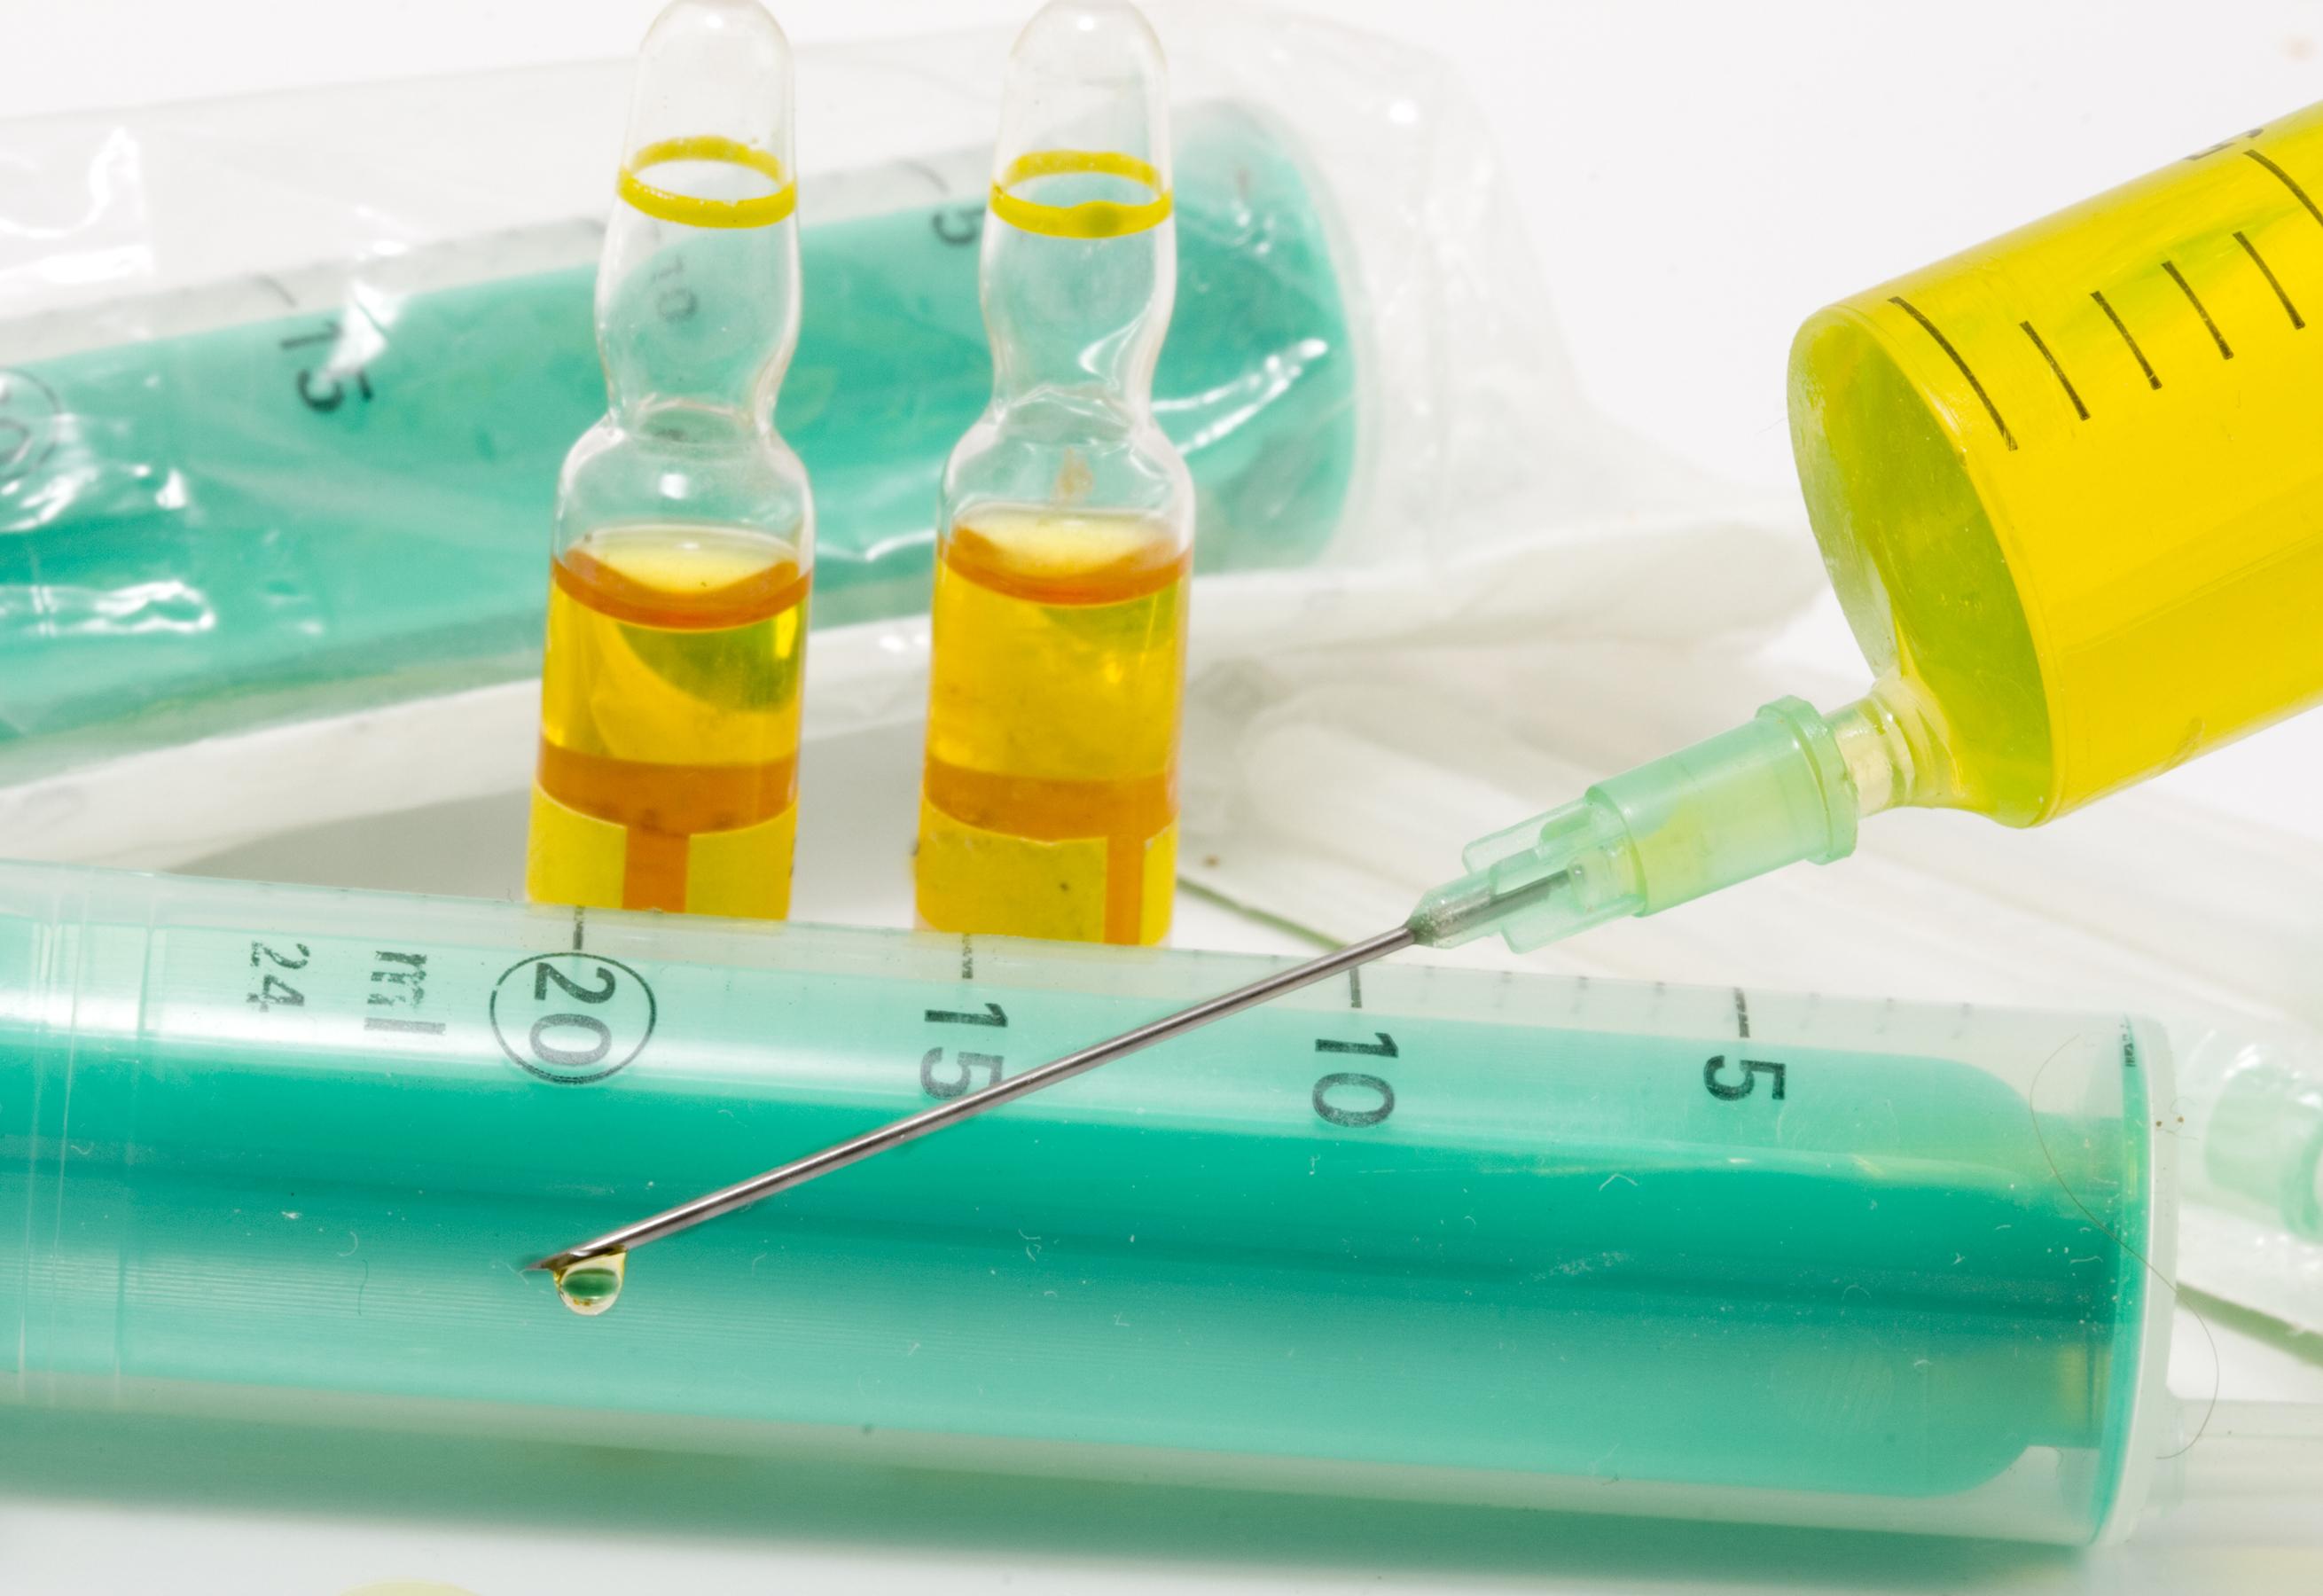 Venele unguent medicament efektivnosti